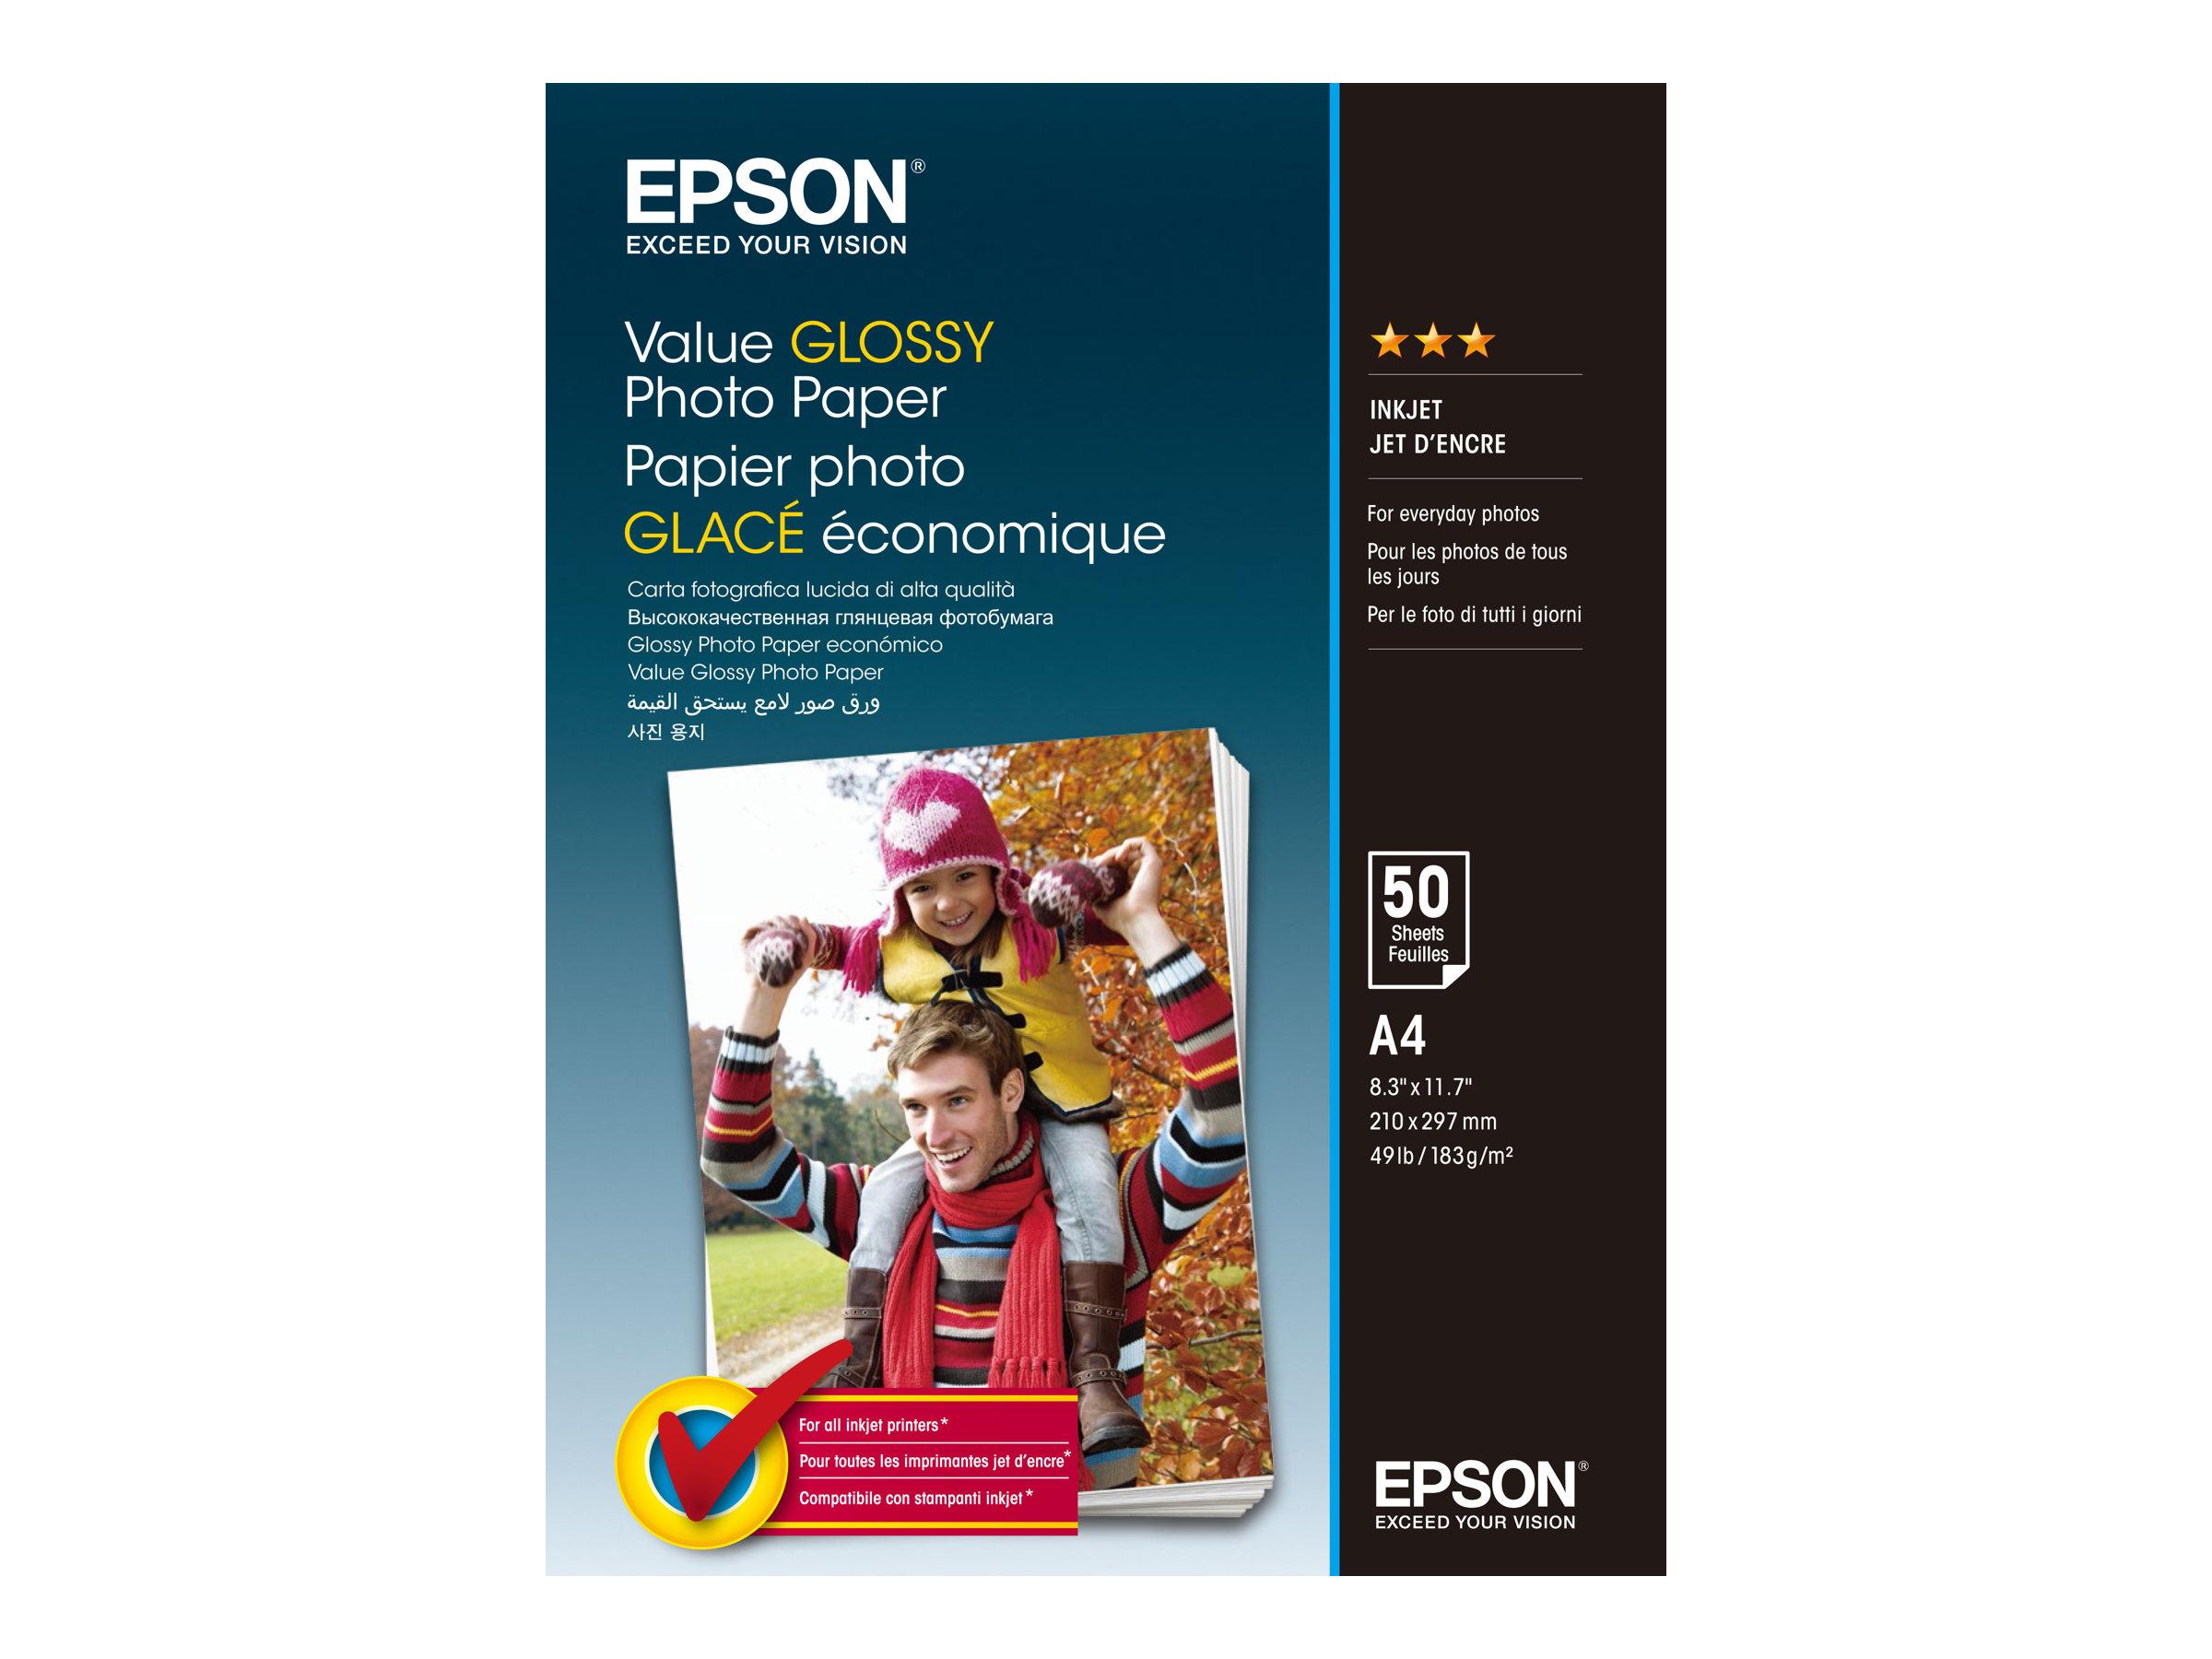 Epson Value - Glänzend - A4 (210 x 297 mm) - 183 g/m² - 50 Blatt Fotopapier - für Epson L382, L386, L486; Expression Home HD XP-